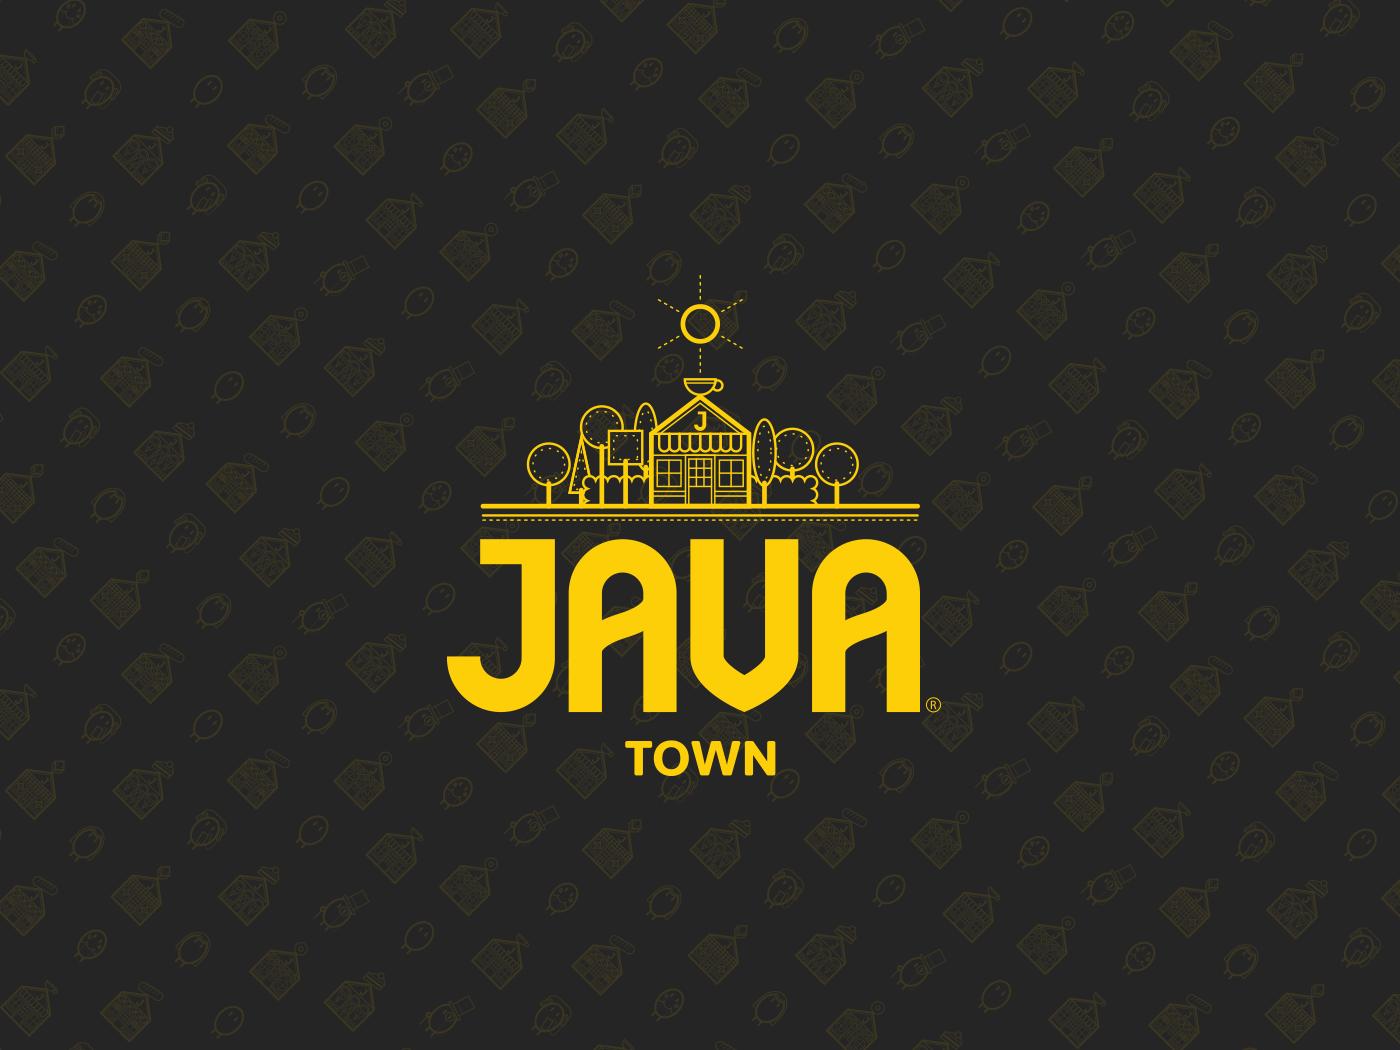 Logo And Branding Design For Java Town By Brutally Simple Bistro Branding Cafe Advertising Restaurant Bra Coffee Shop Branding Cafe Logo Design Cafe Logo